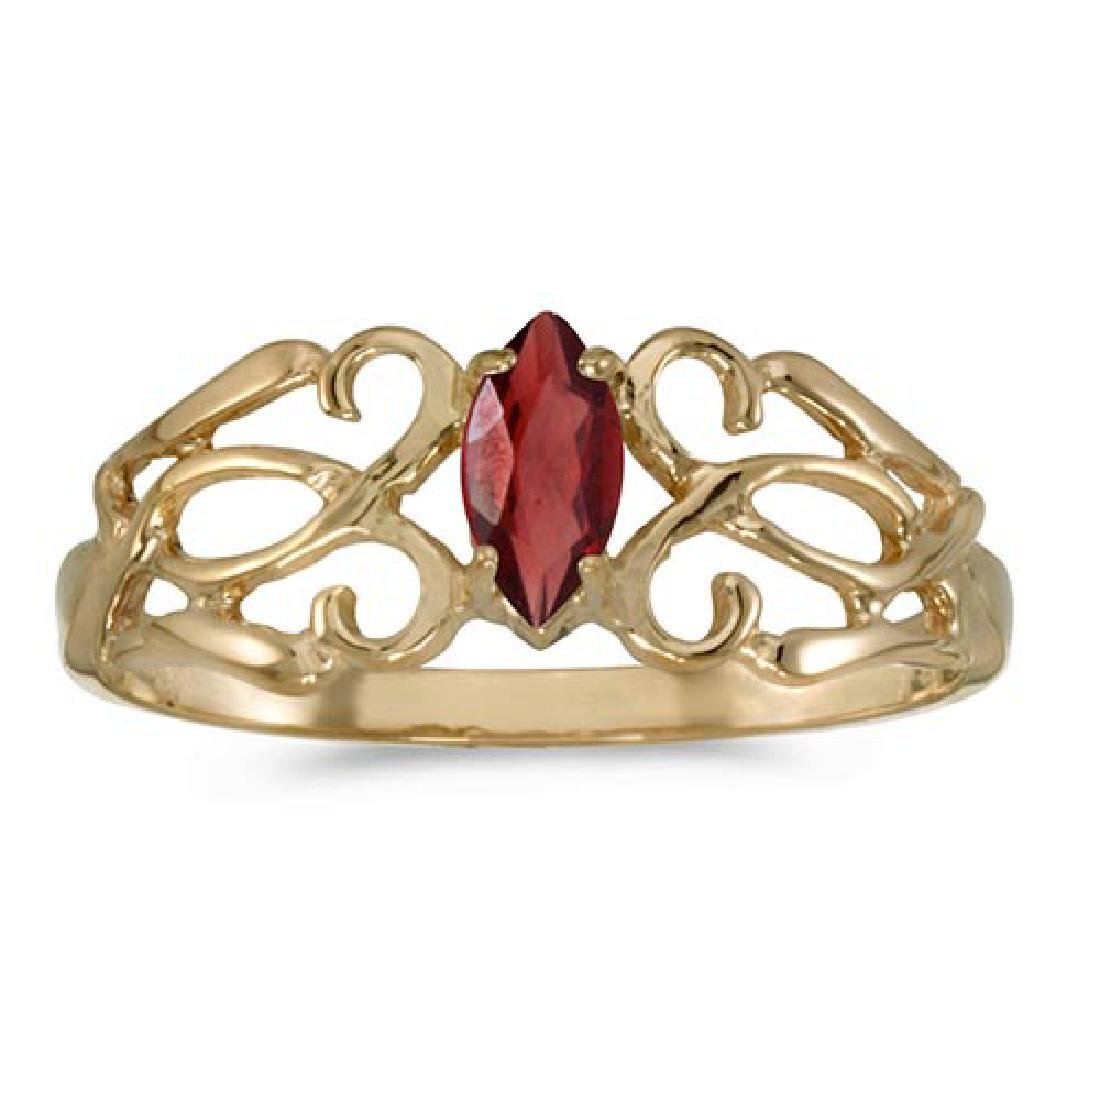 Certified 10k Yellow Gold Marquise Garnet Filagree Ring